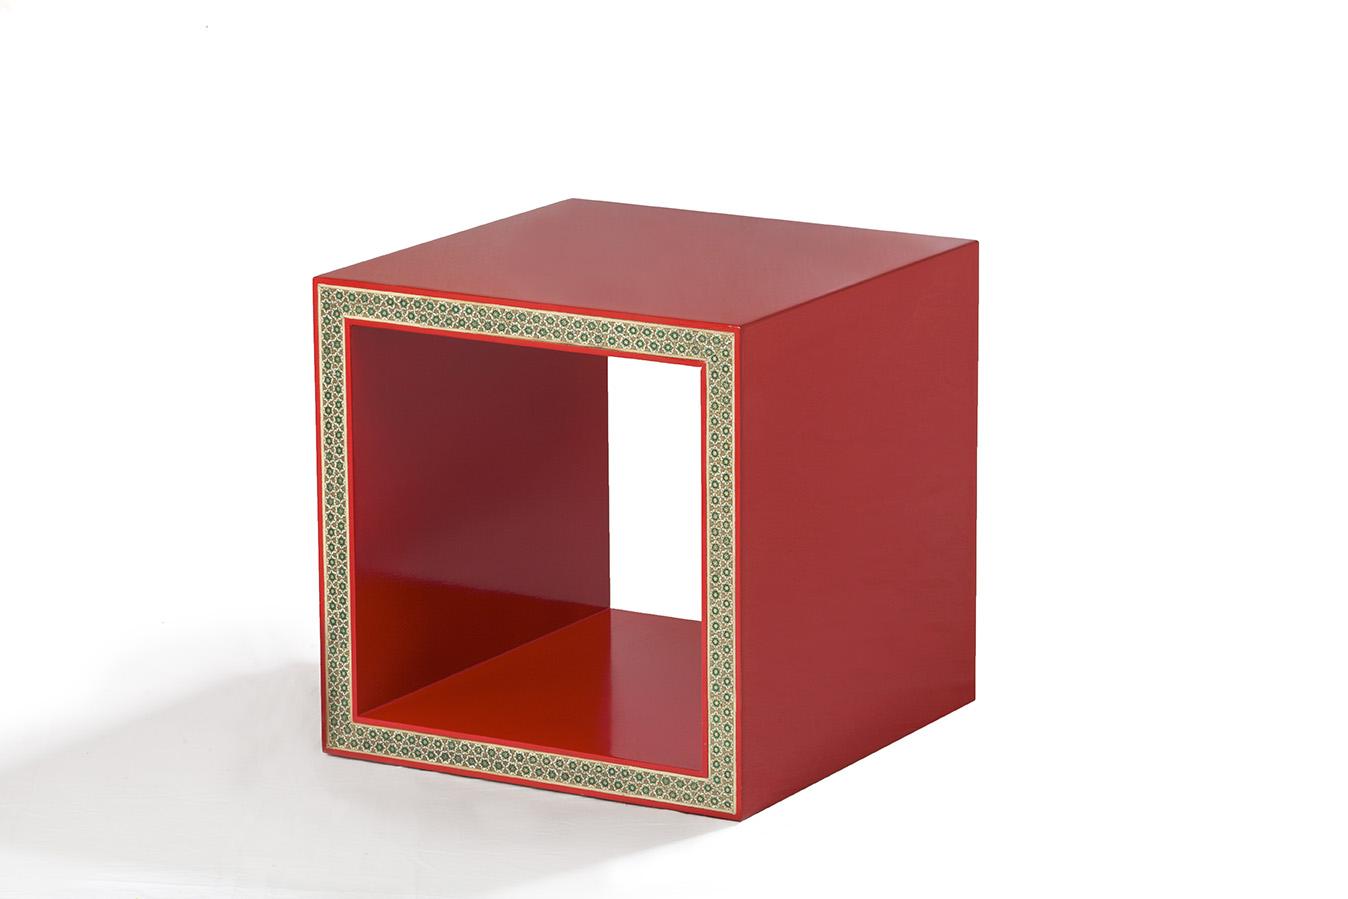 bam cube stool